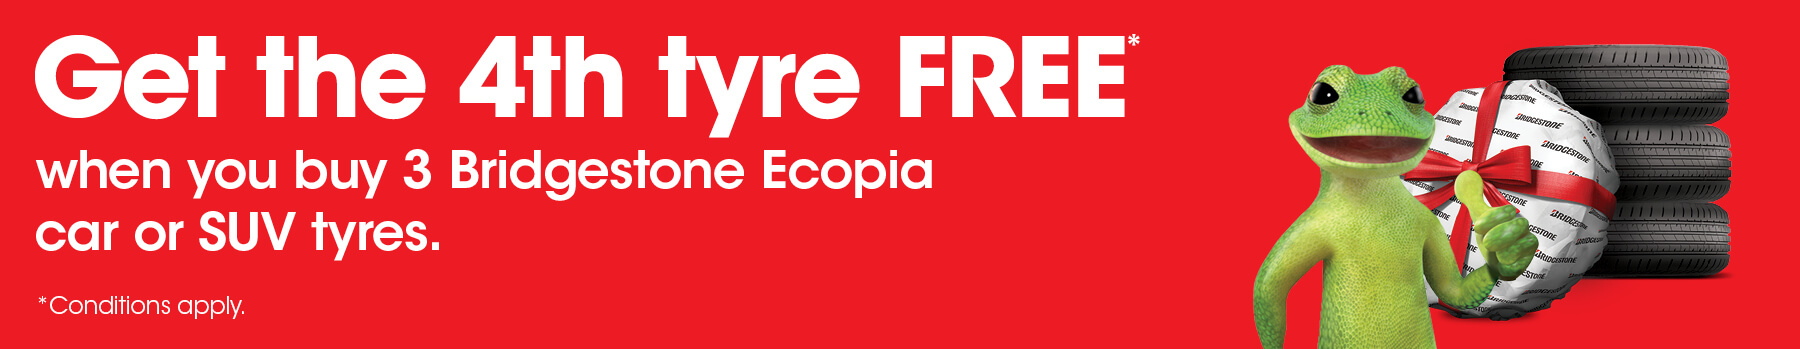 Get the 4th tyre free when you buy 3 Bridgestone Ecopia car or SUV tyres